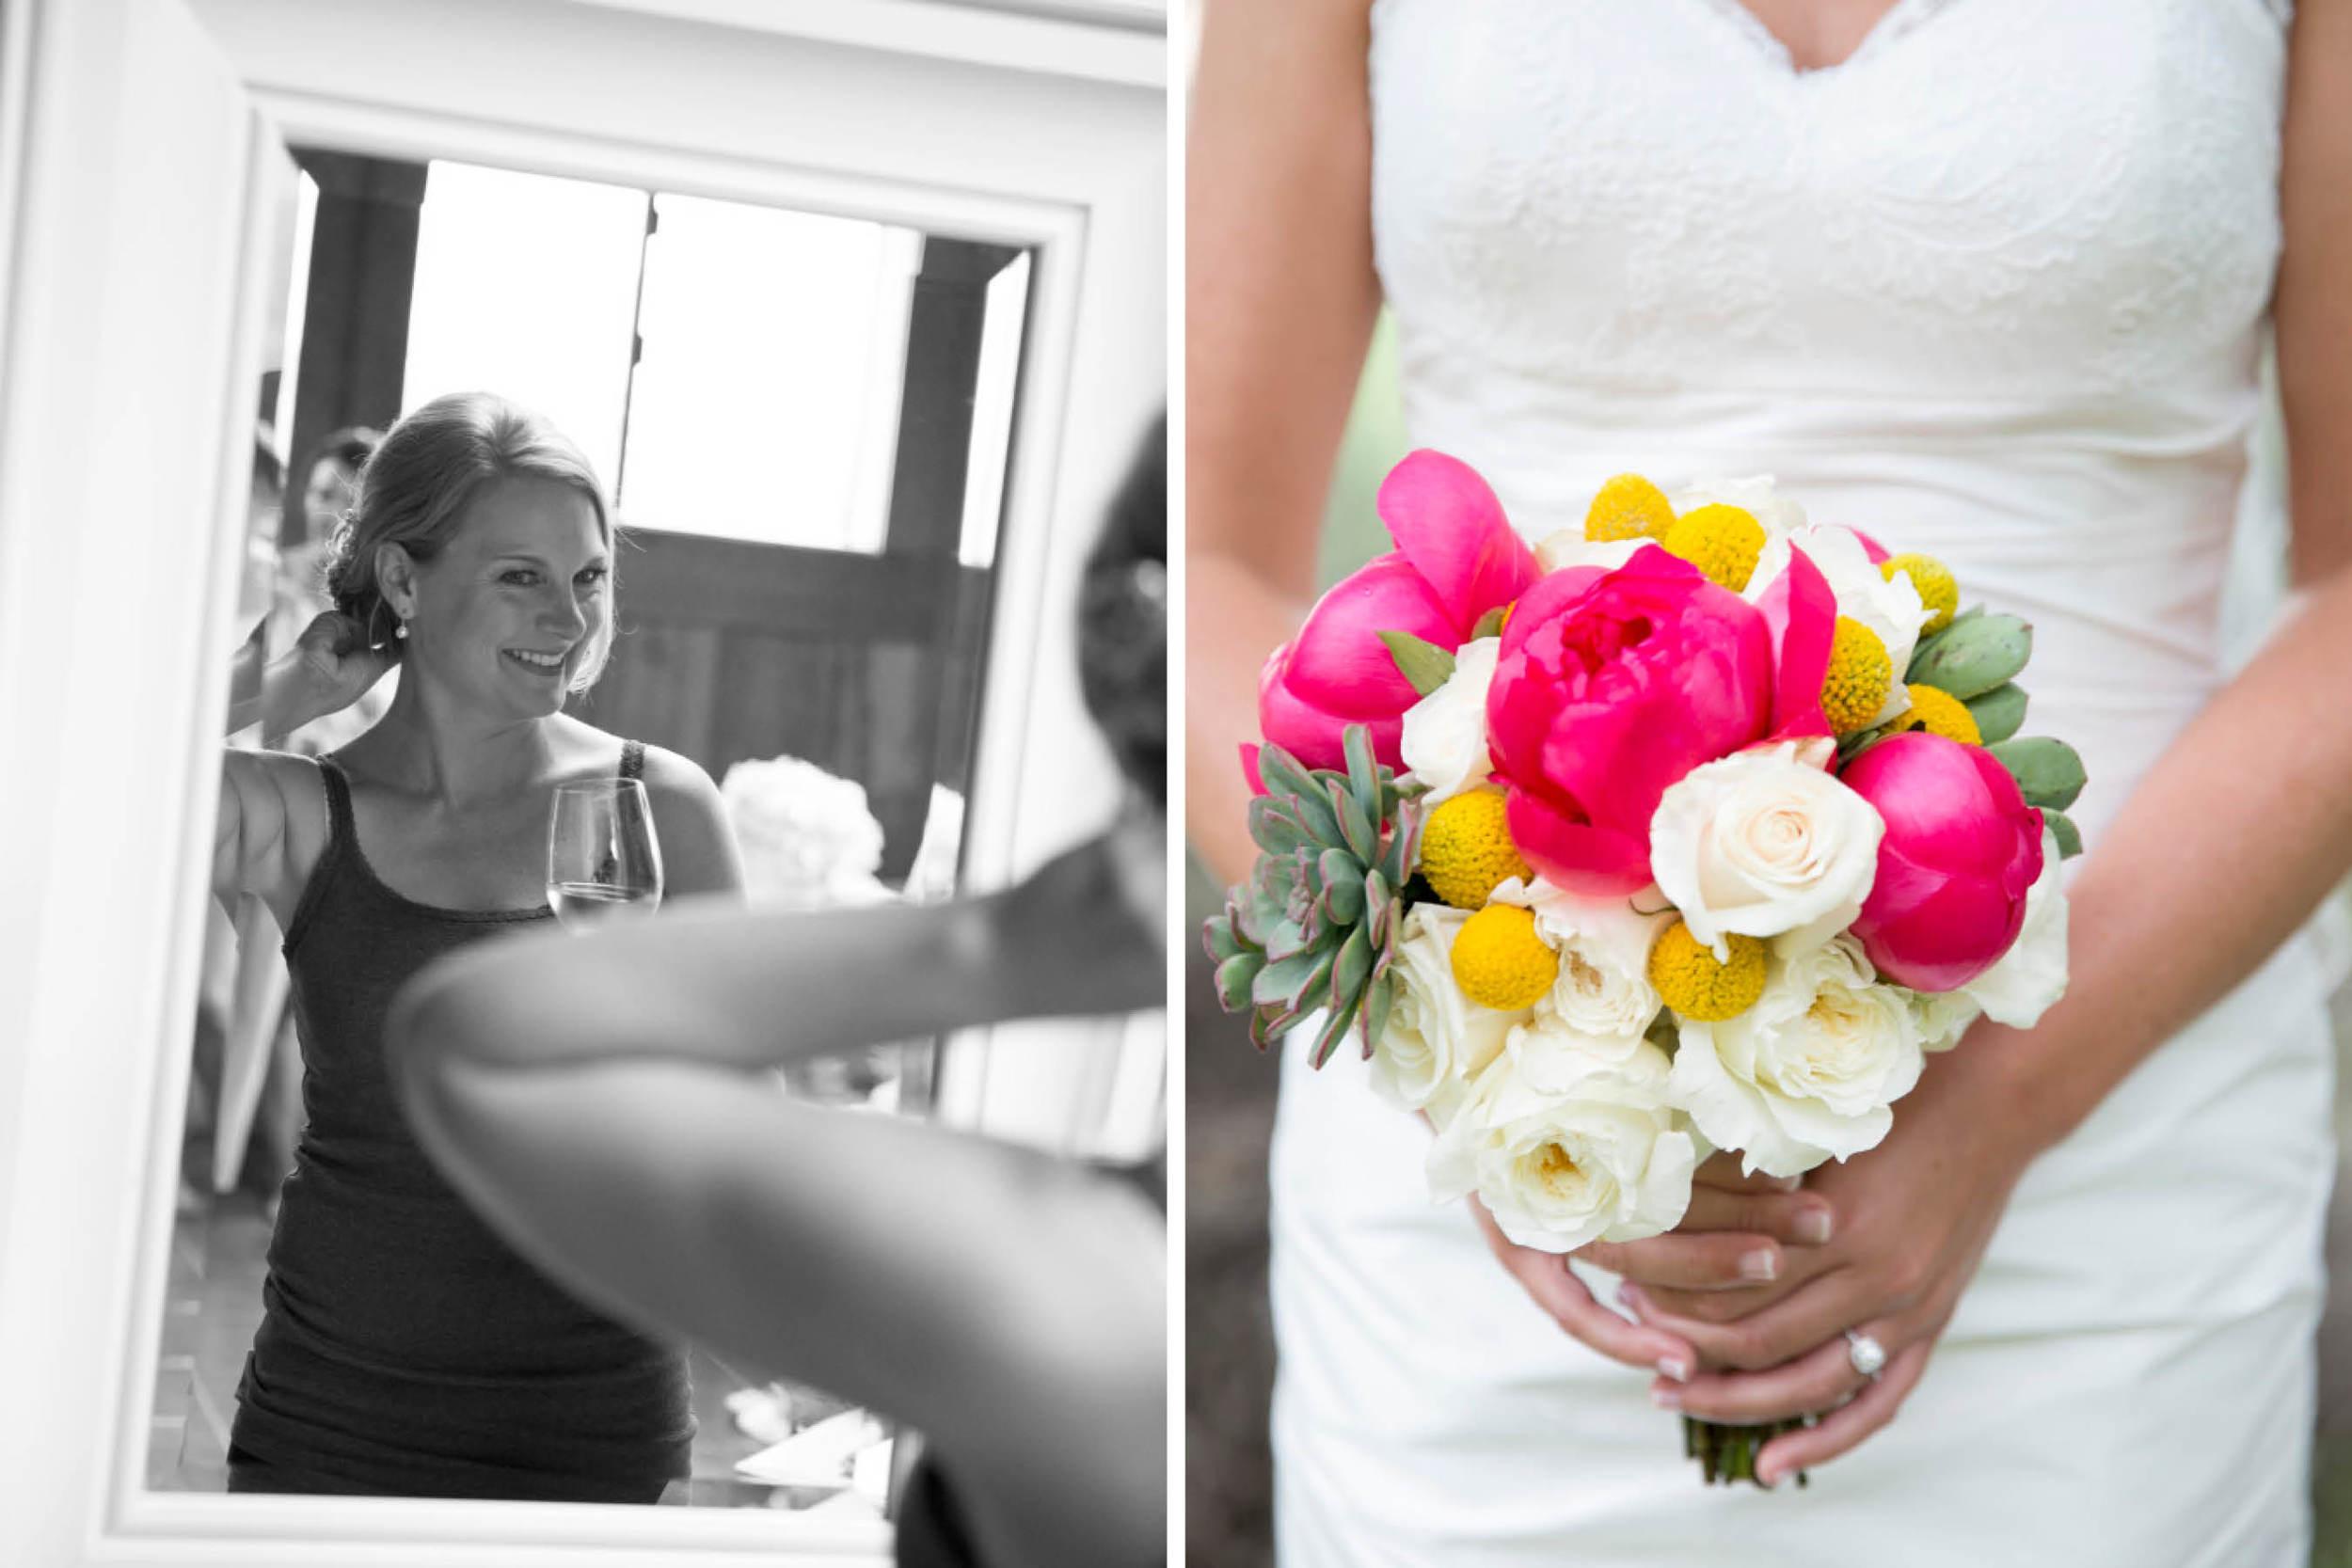 firestone-winery-vineyard-wedding-planner-coordinator-santa-barbara-ynez-los-olivos (9).jpg